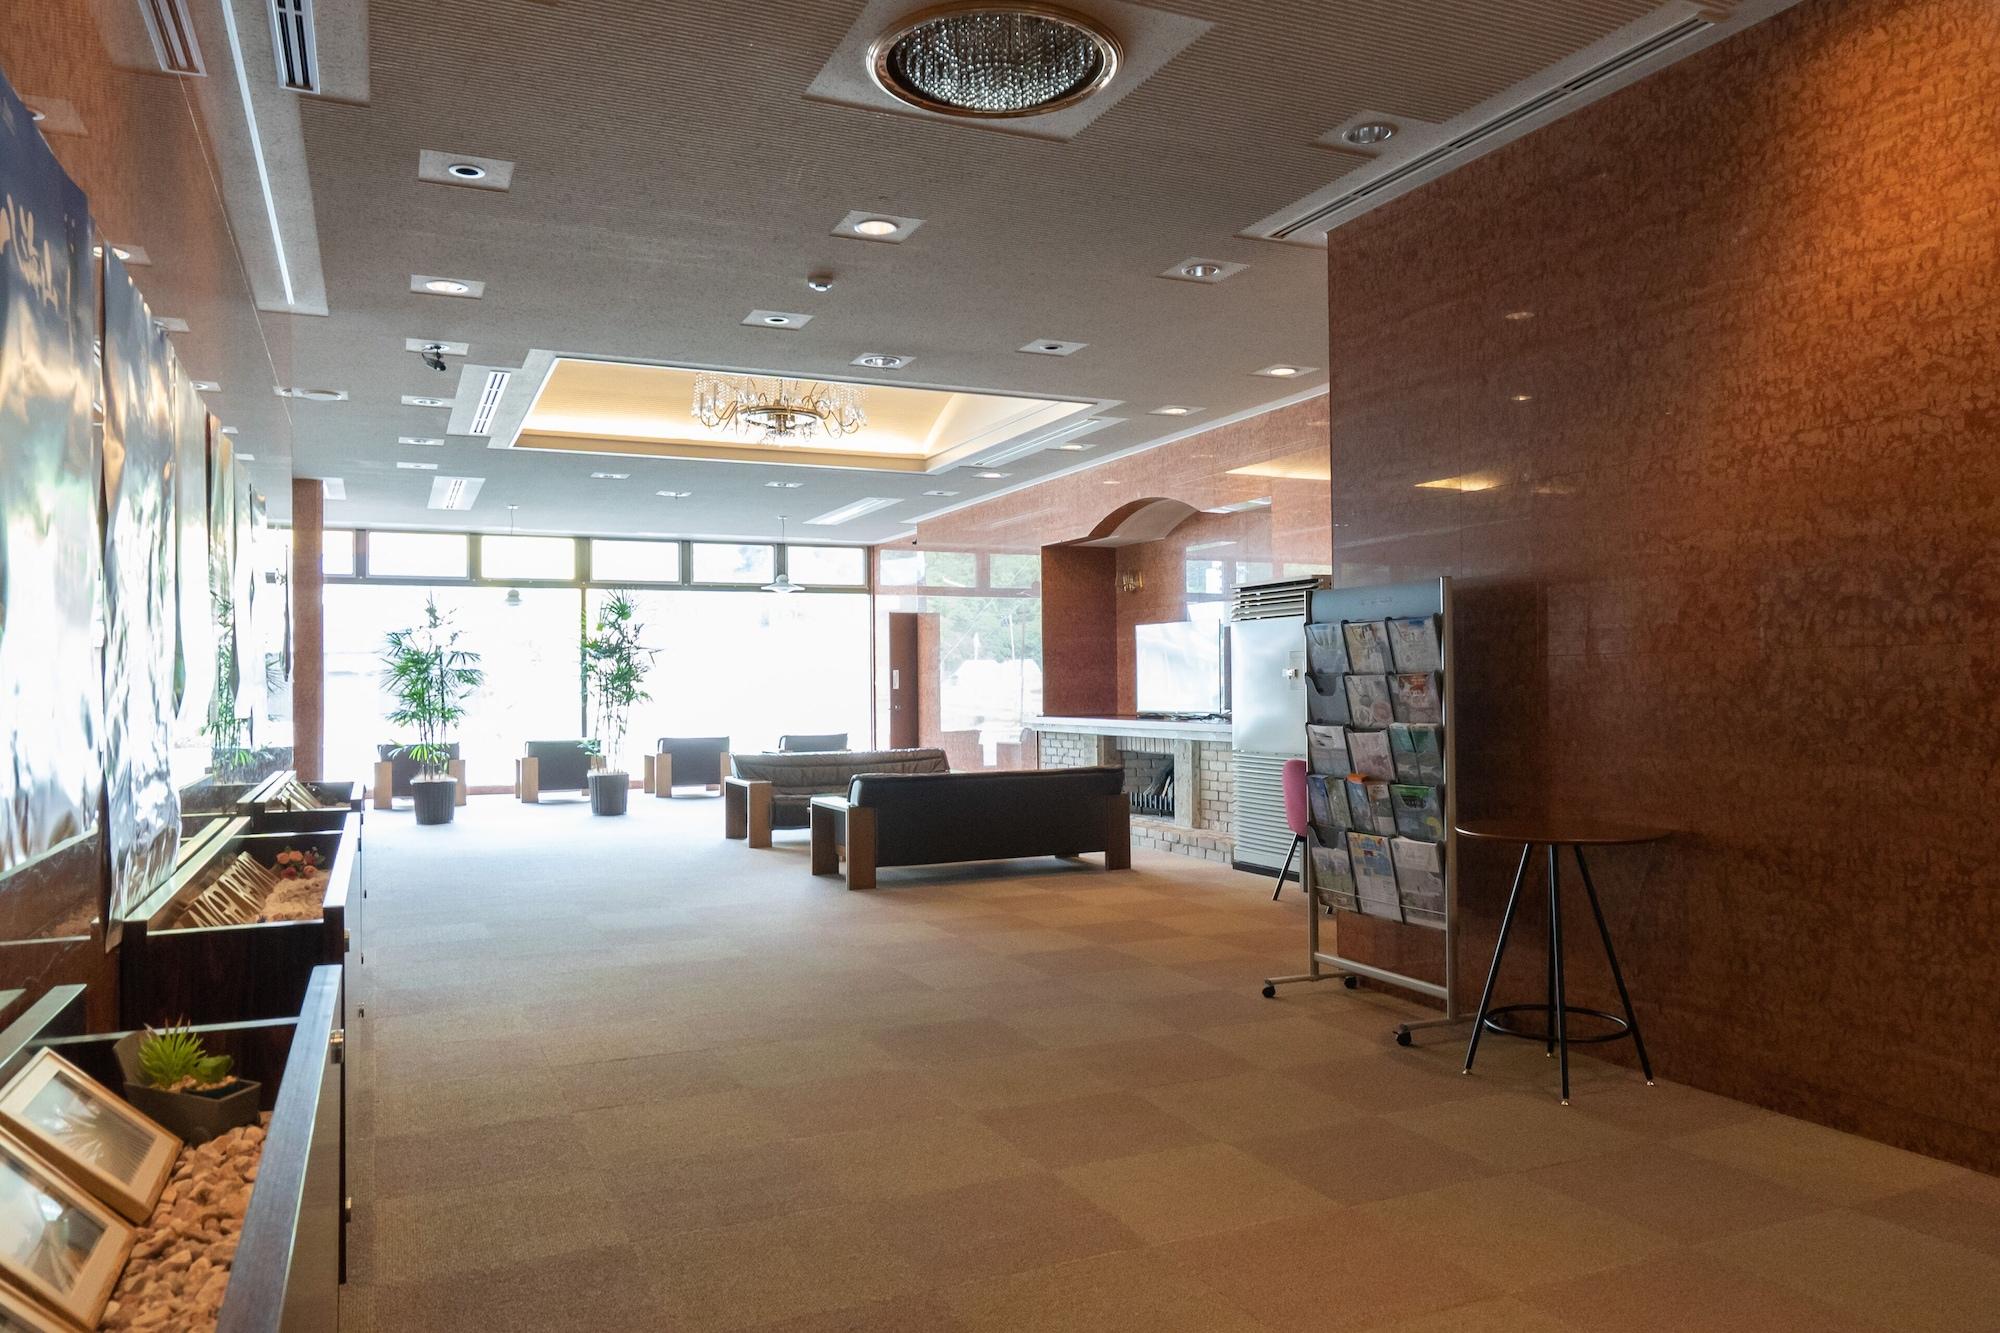 Angel Resort Yuzawa 813, Yuzawa